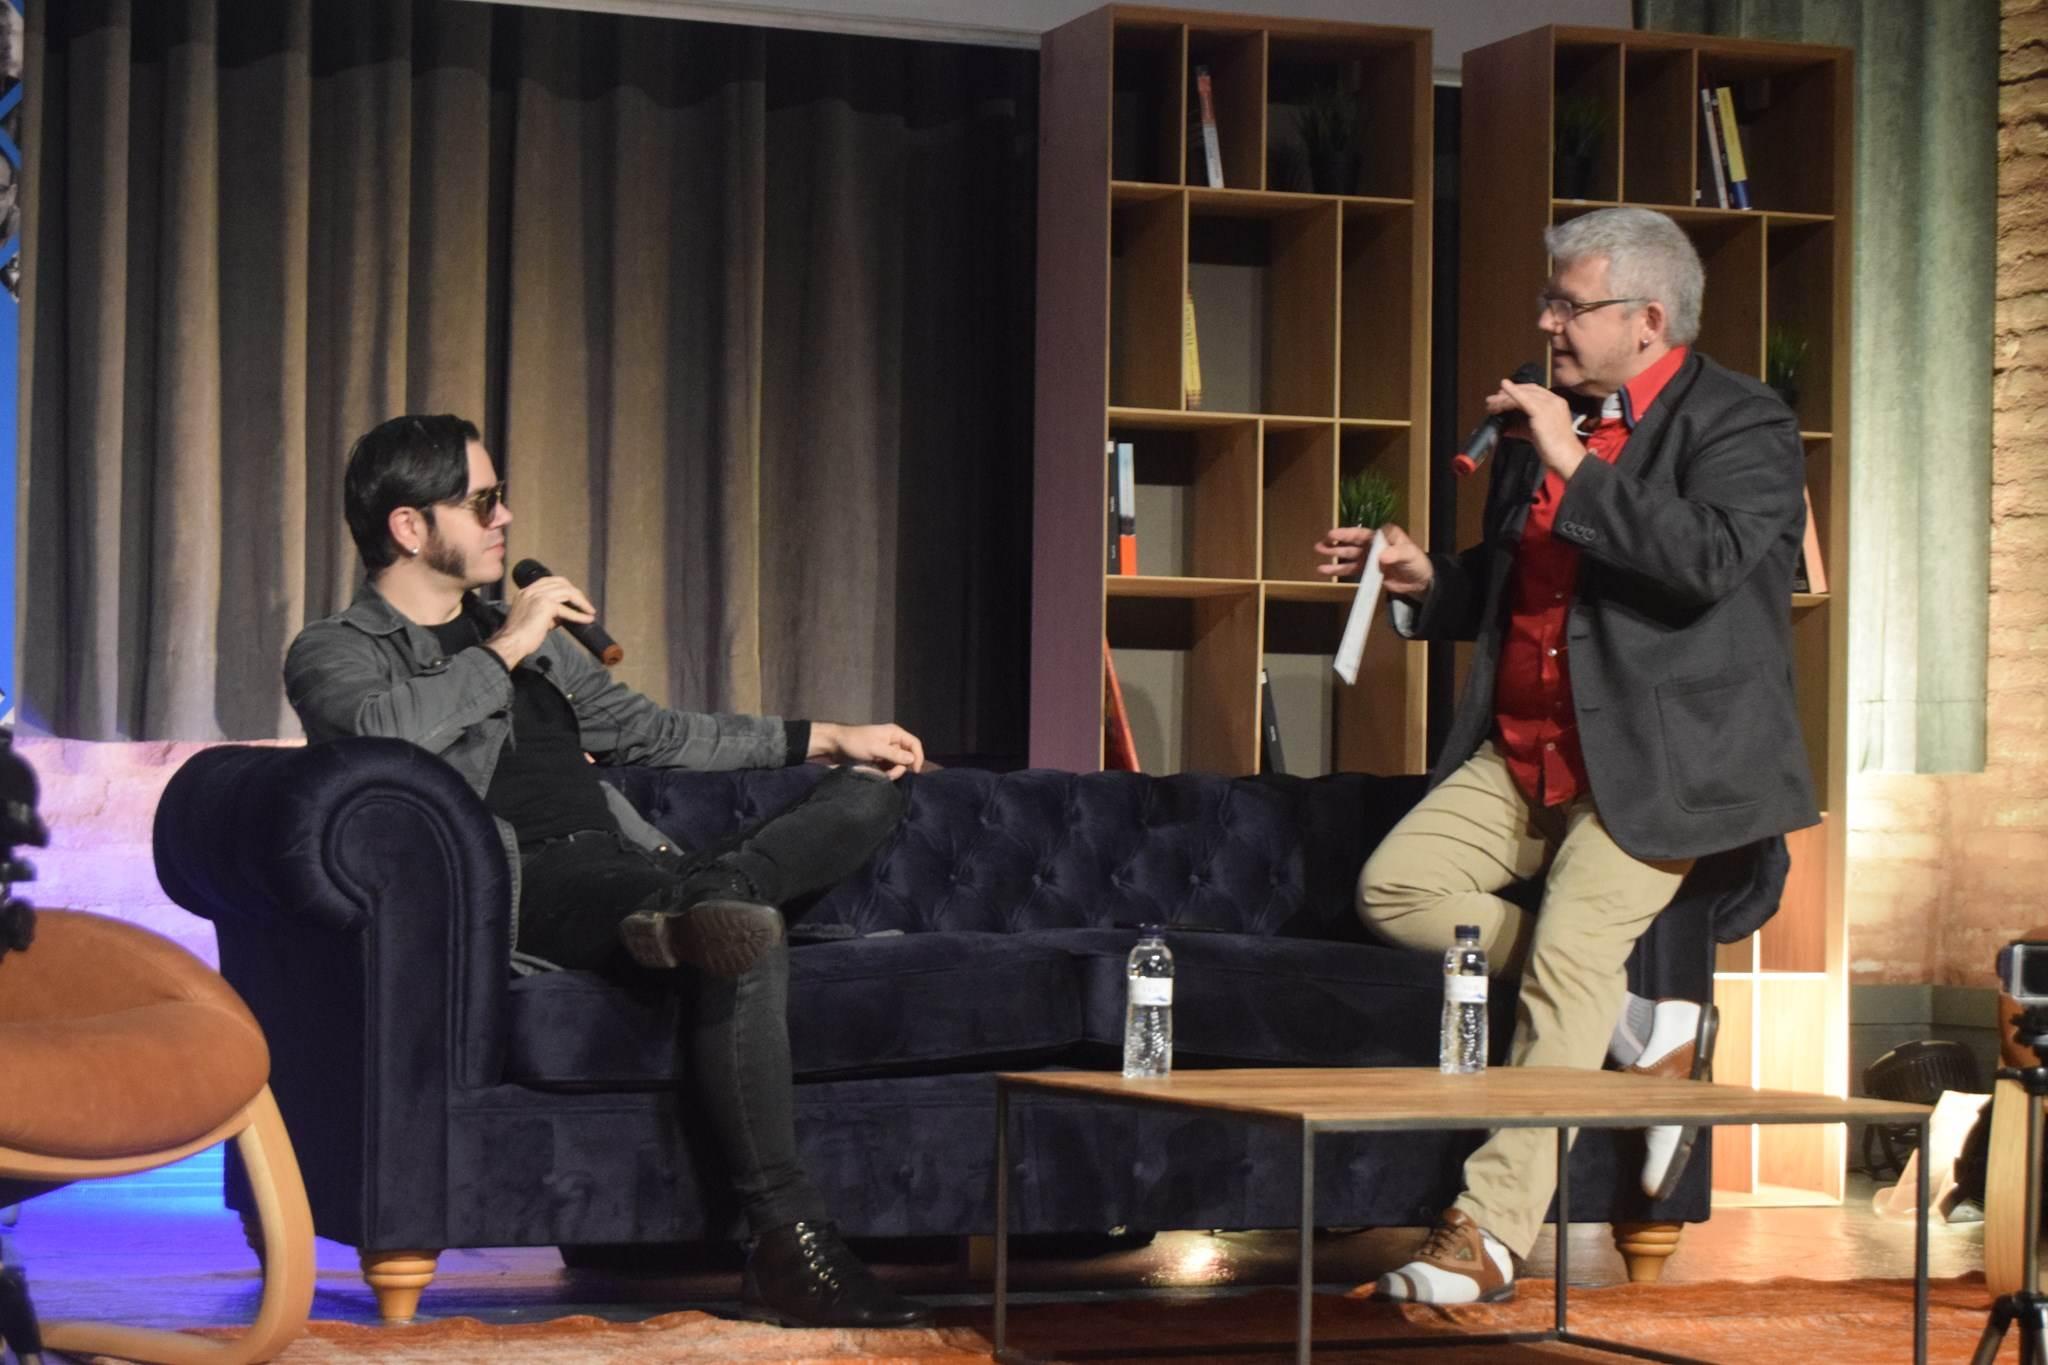 Els patillerus! Màrius Serra entrevistant Arnau Tordera